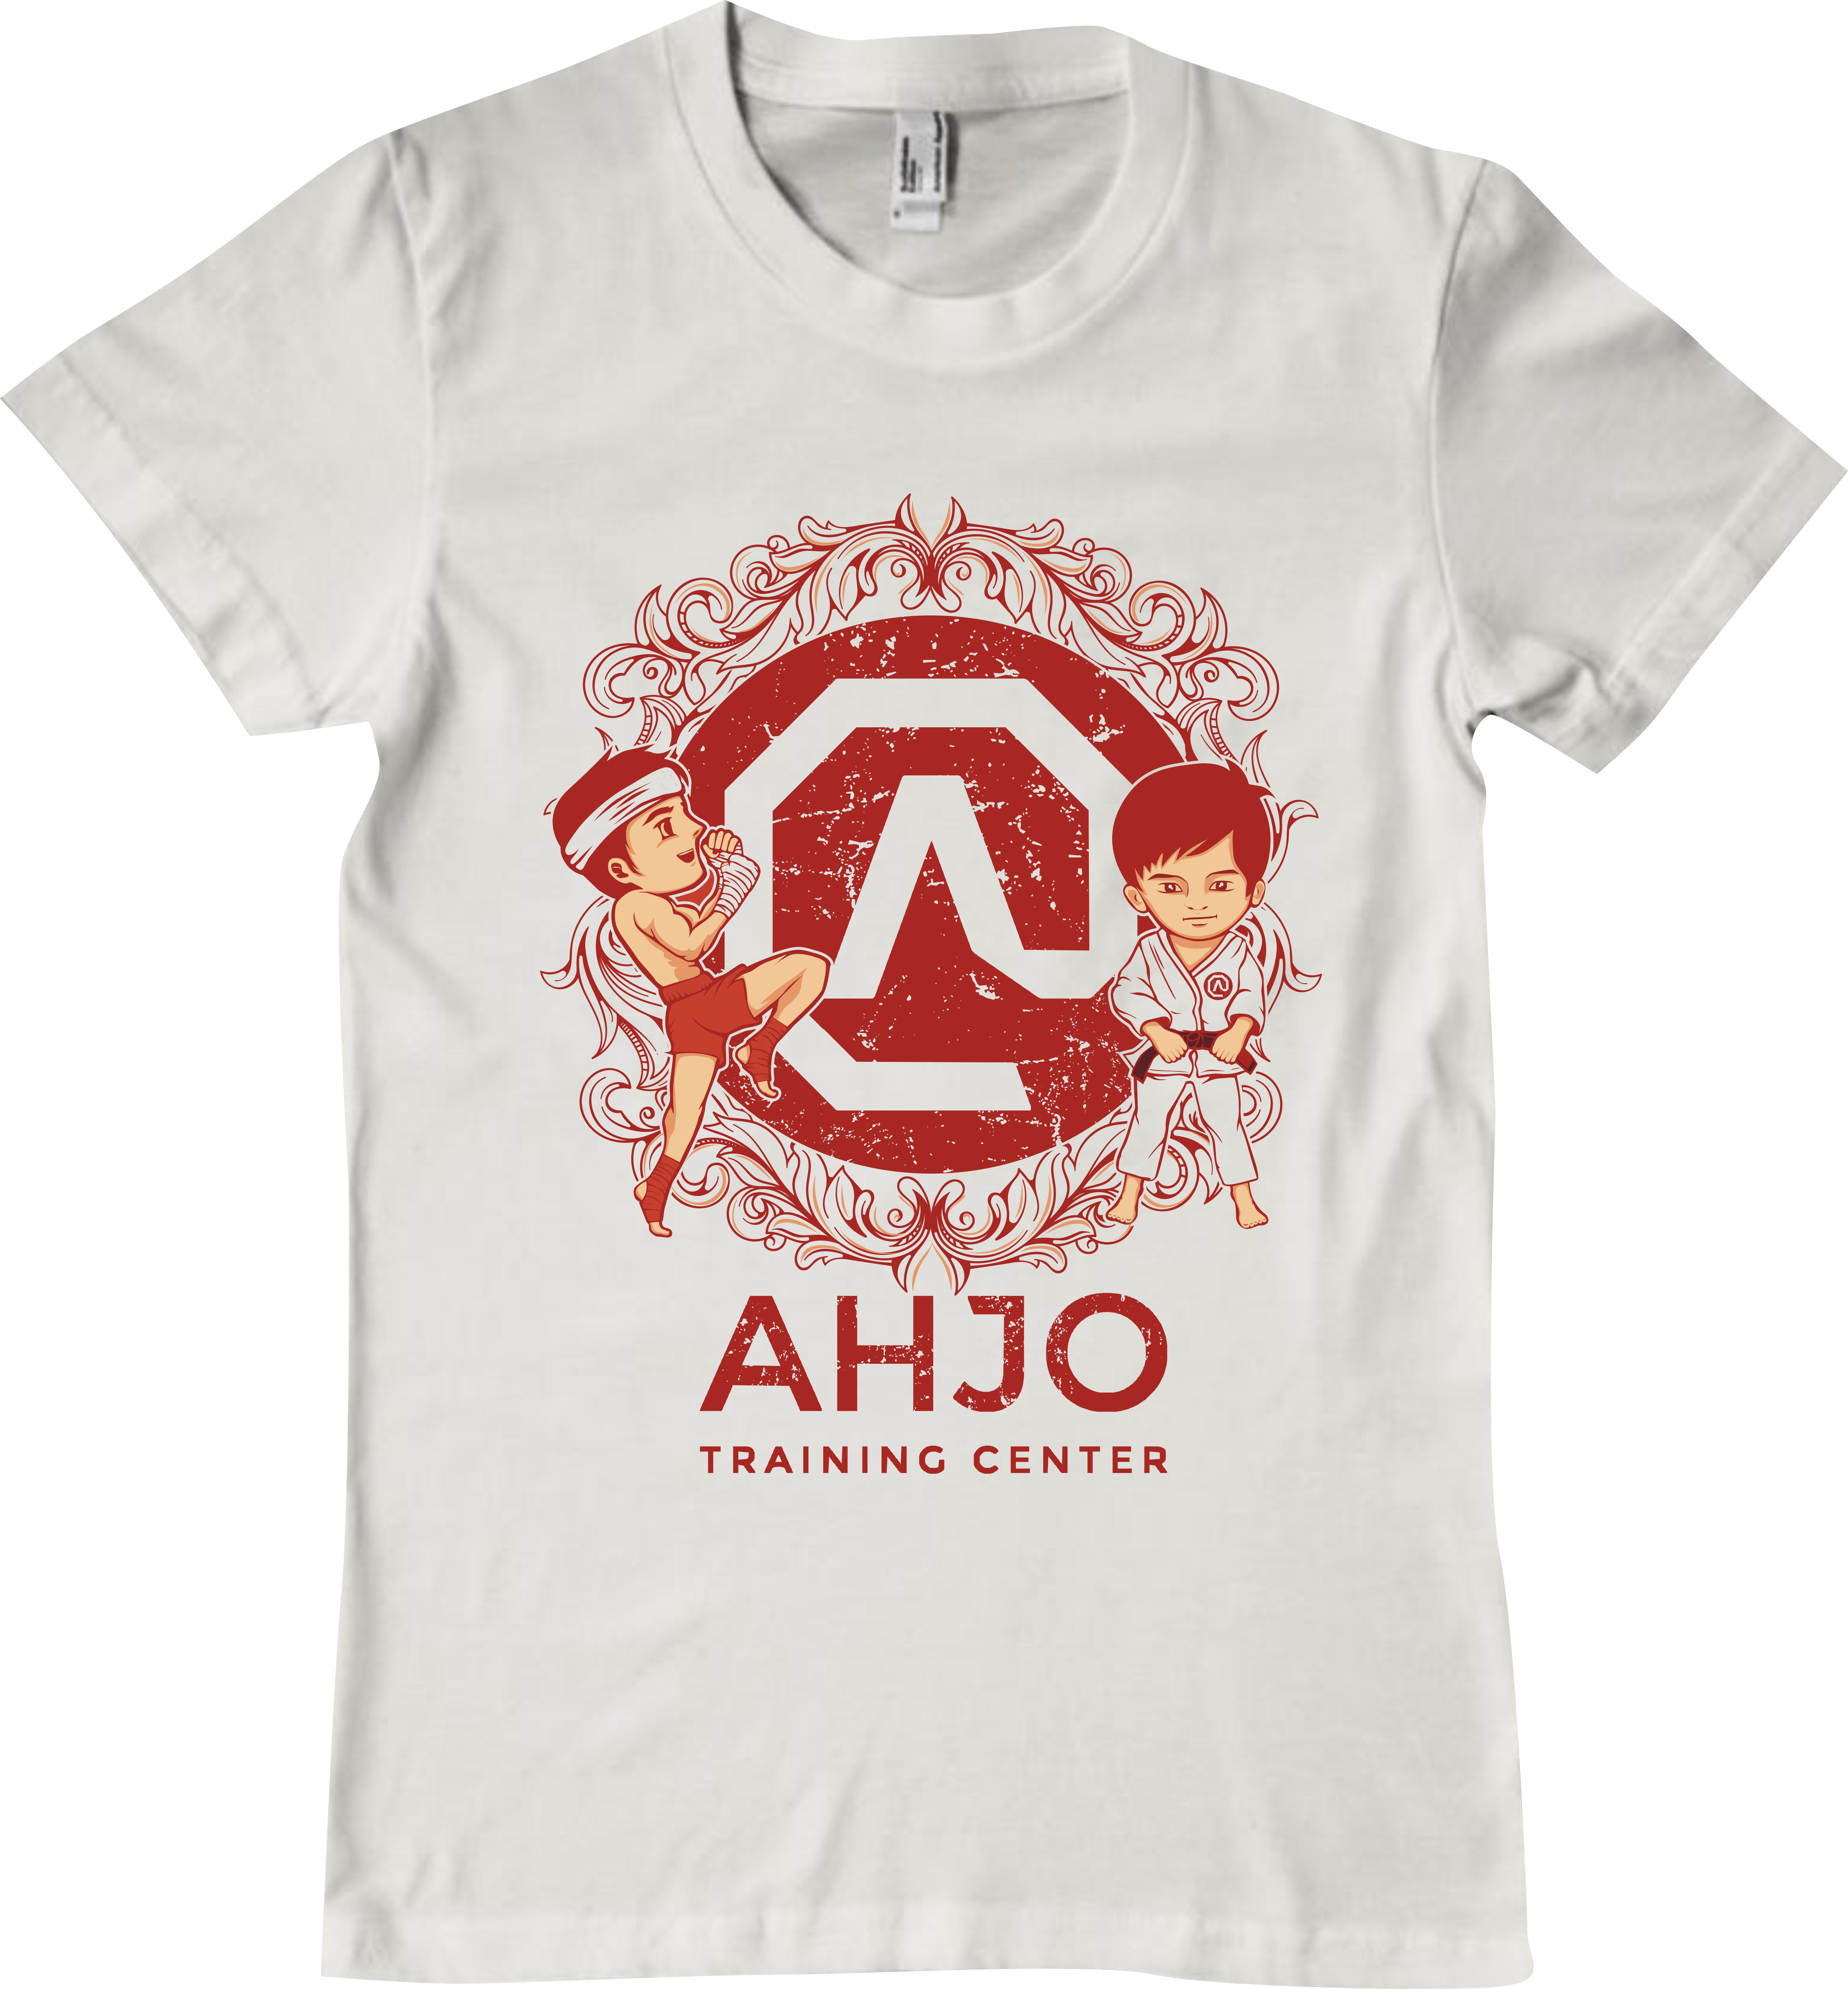 Create a fun t-shirt design for Ahjo Training Center